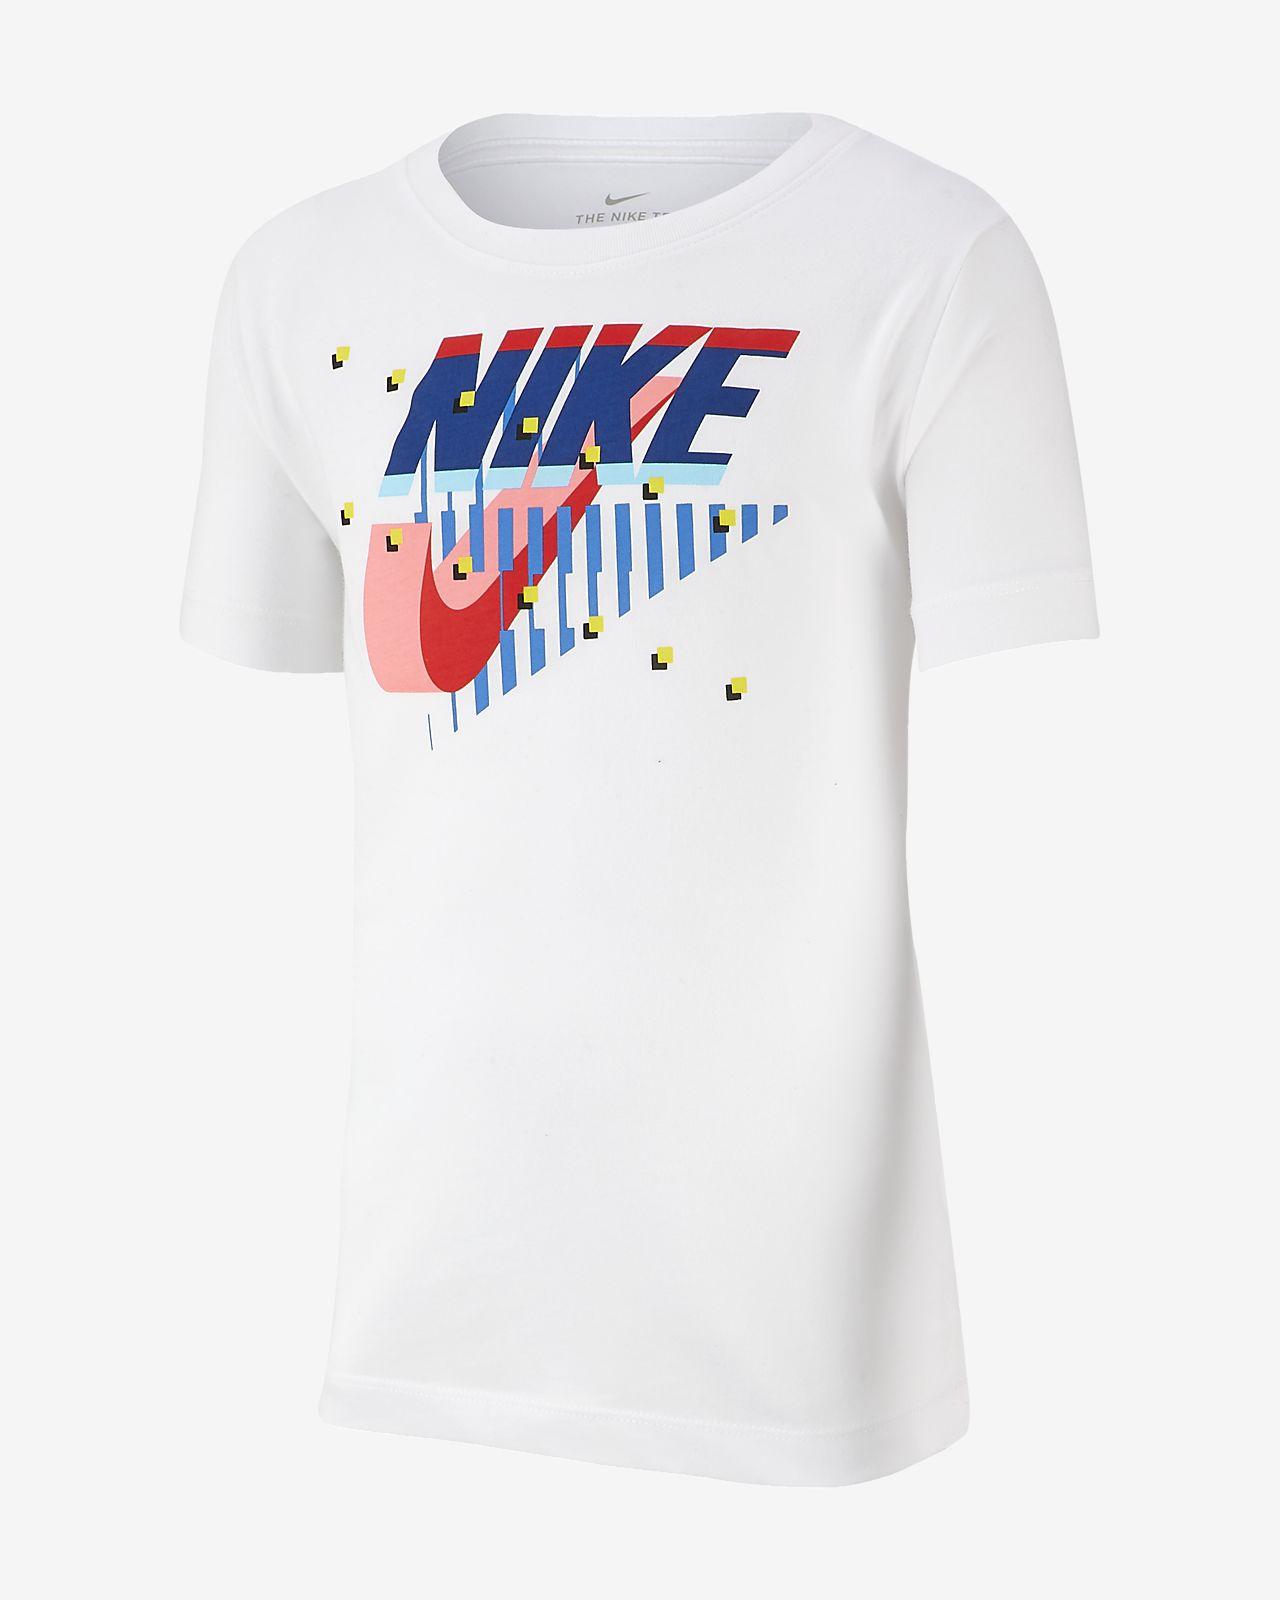 4623923cfe301 Nike Dri-FIT Older Kids' (Boys') Training T-Shirt. Nike.com VN